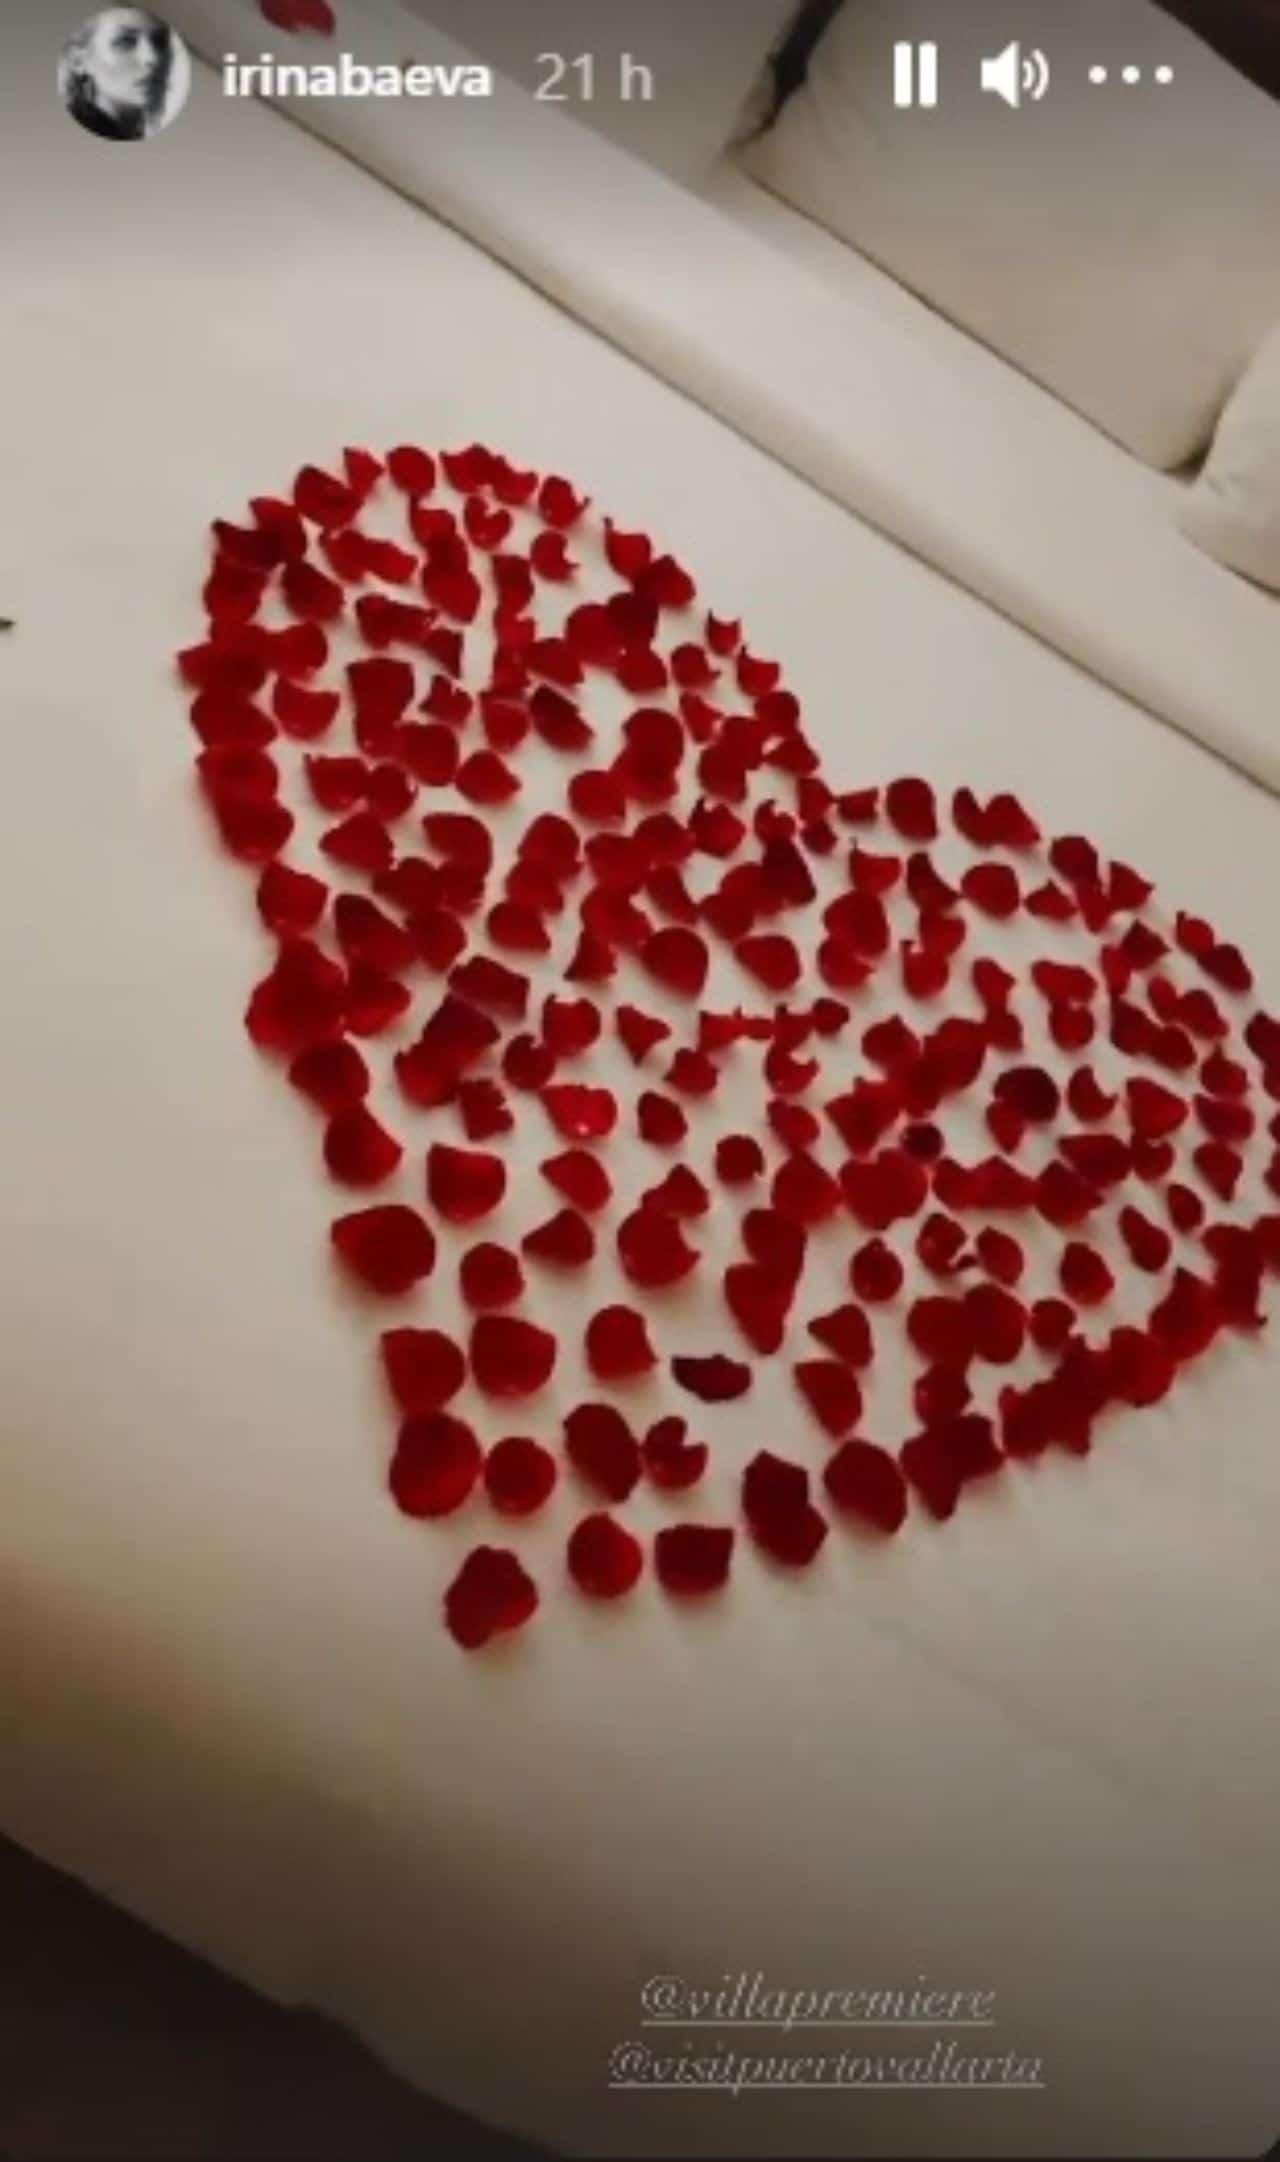 Irina Baeva corazón cama